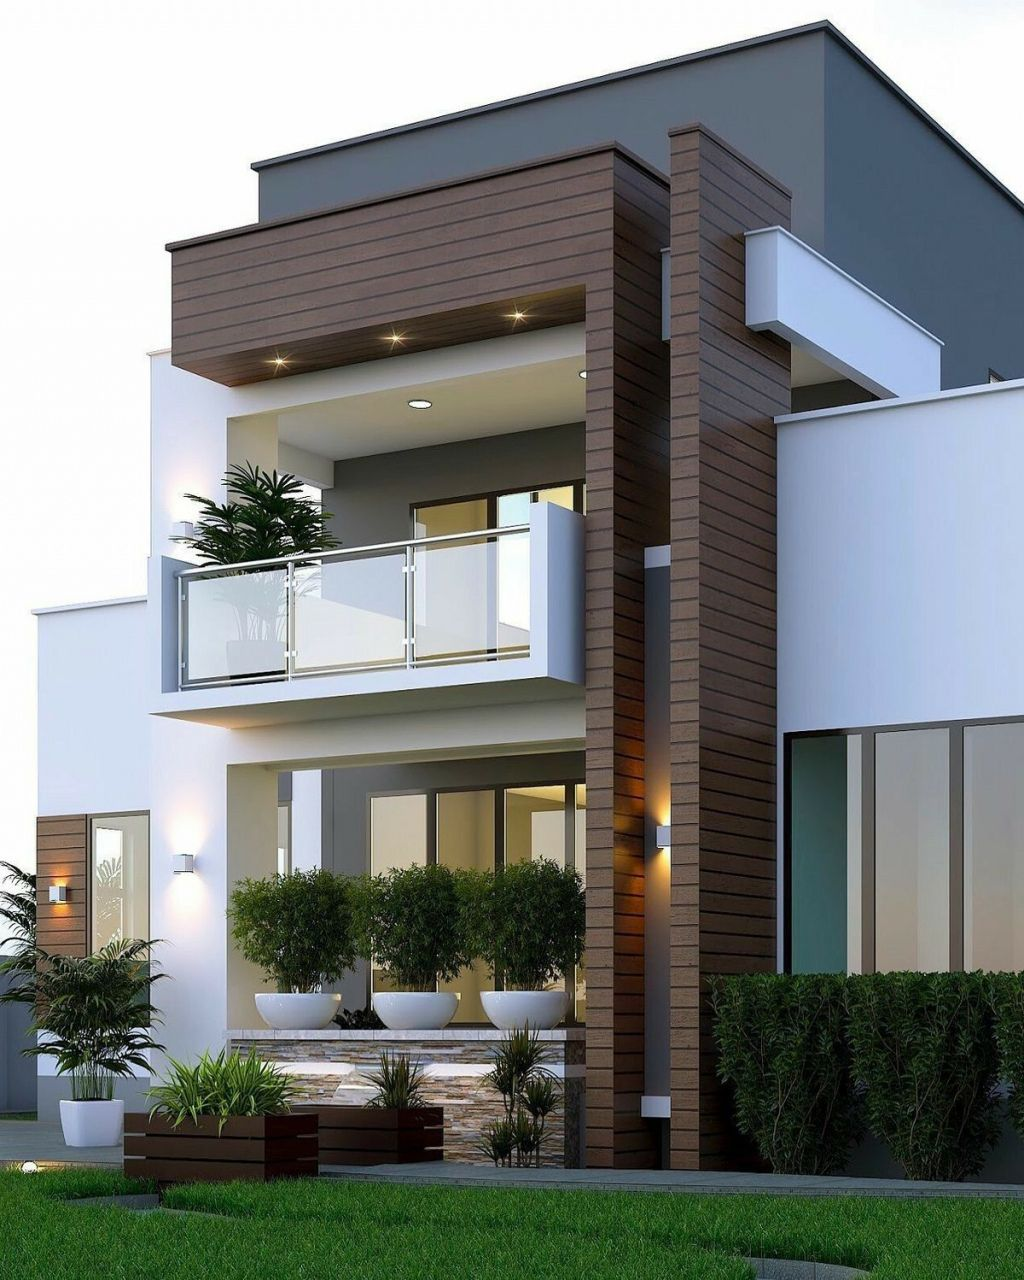 50 Simple And Elegant House 2016 Modern Minimalist House Small House Design Duplex House Design